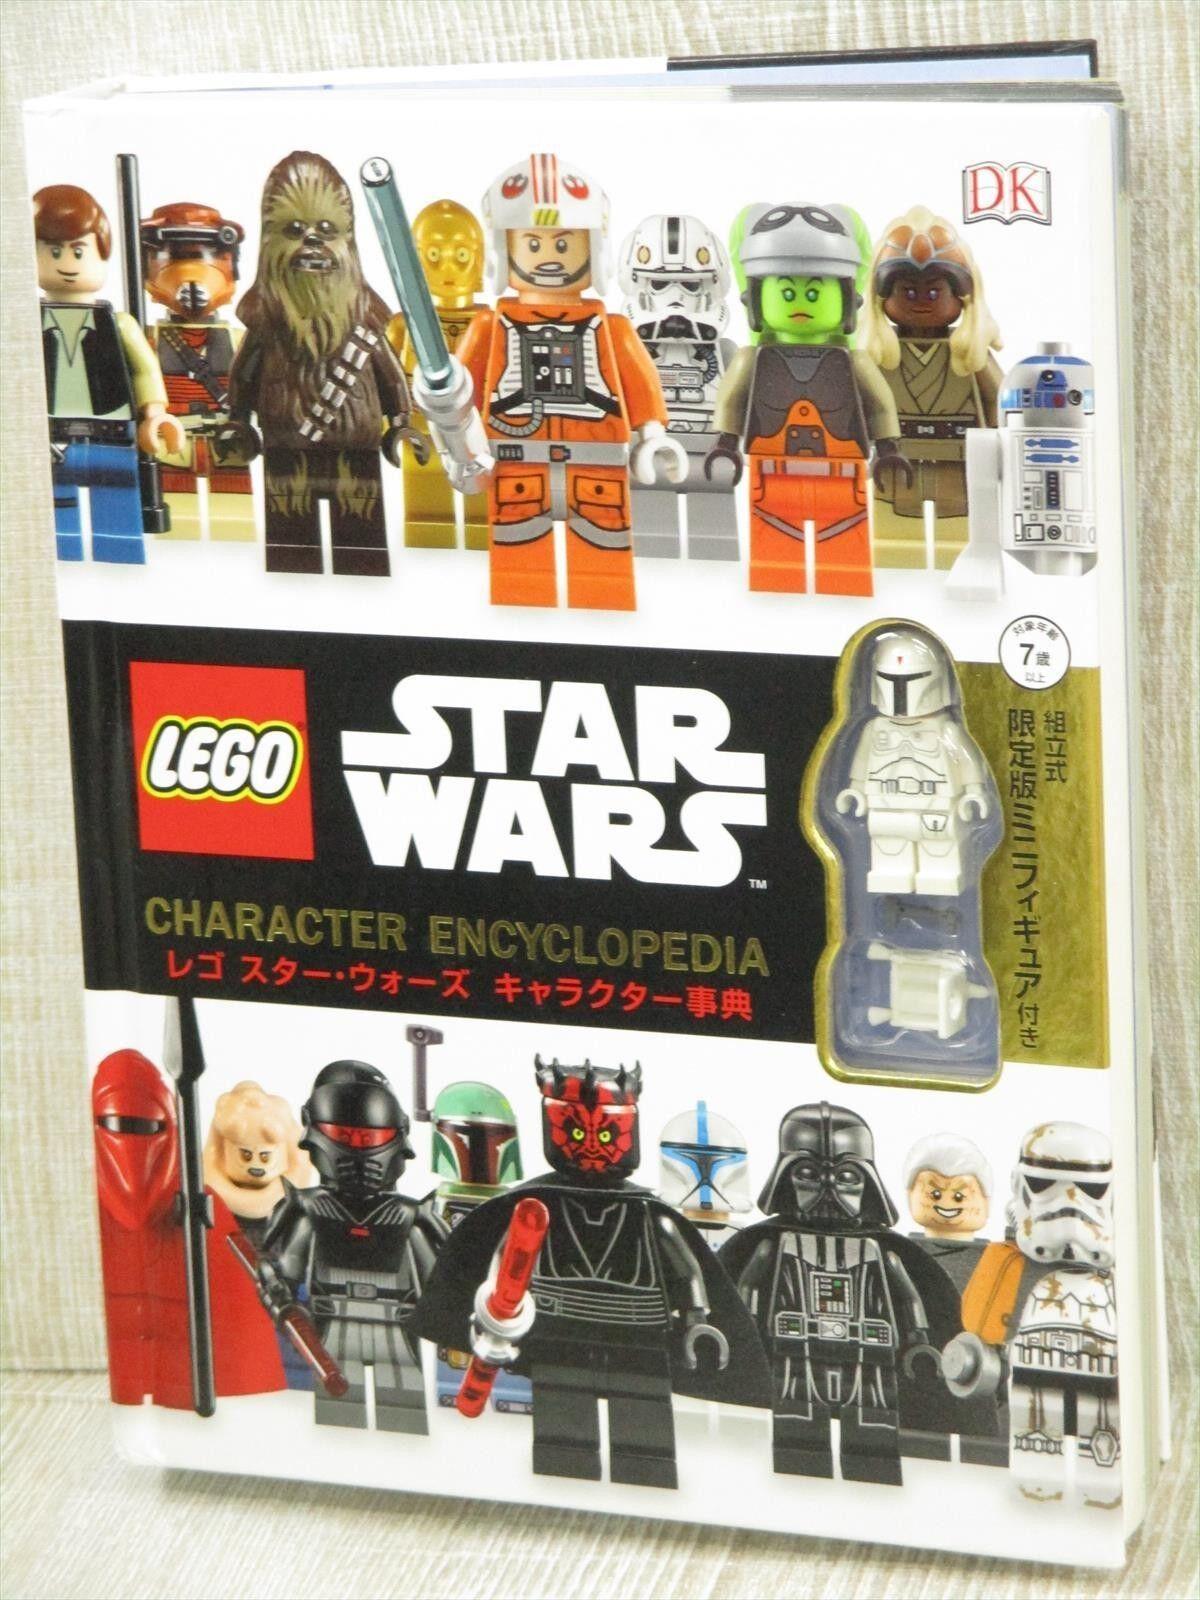 LEGO STAR WARS Character Encyclopedia w Figure Japan Ver. Art Book Catalog